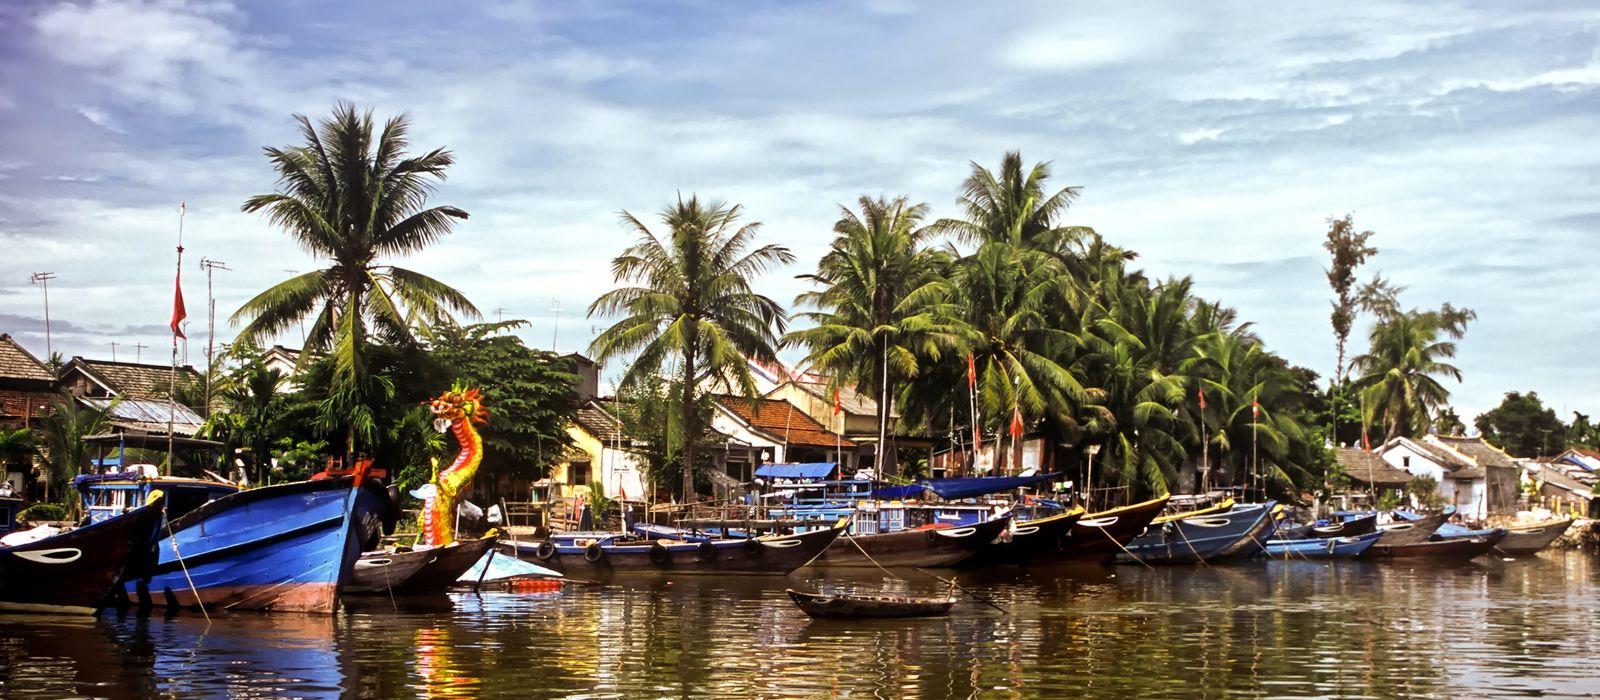 Hotel Mekong Eyes Explorer (Cai Be nach Can Tho ) Vietnam